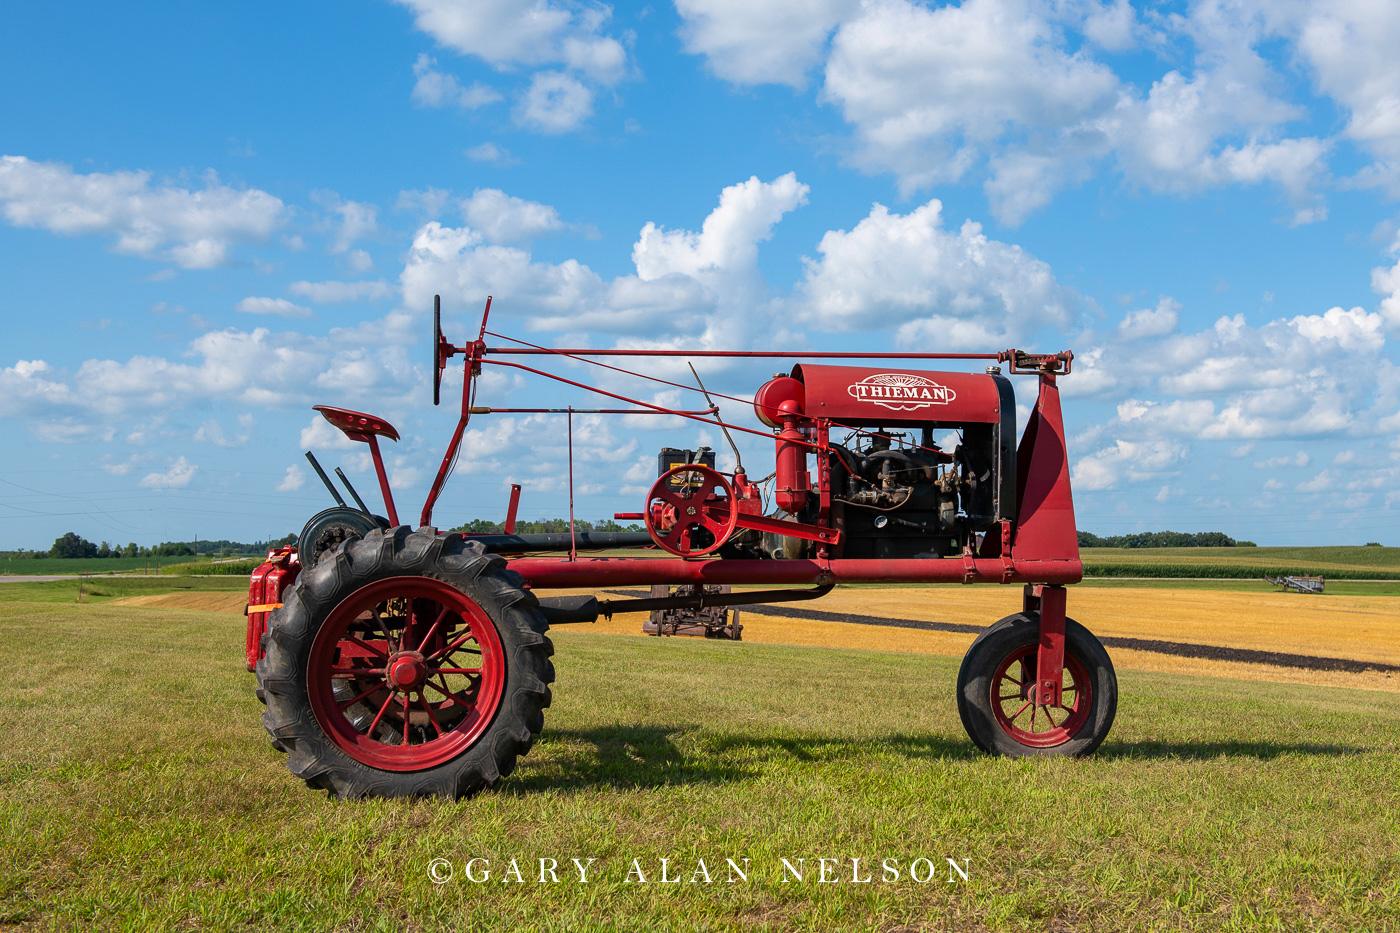 Thieman, antique tractor, photo